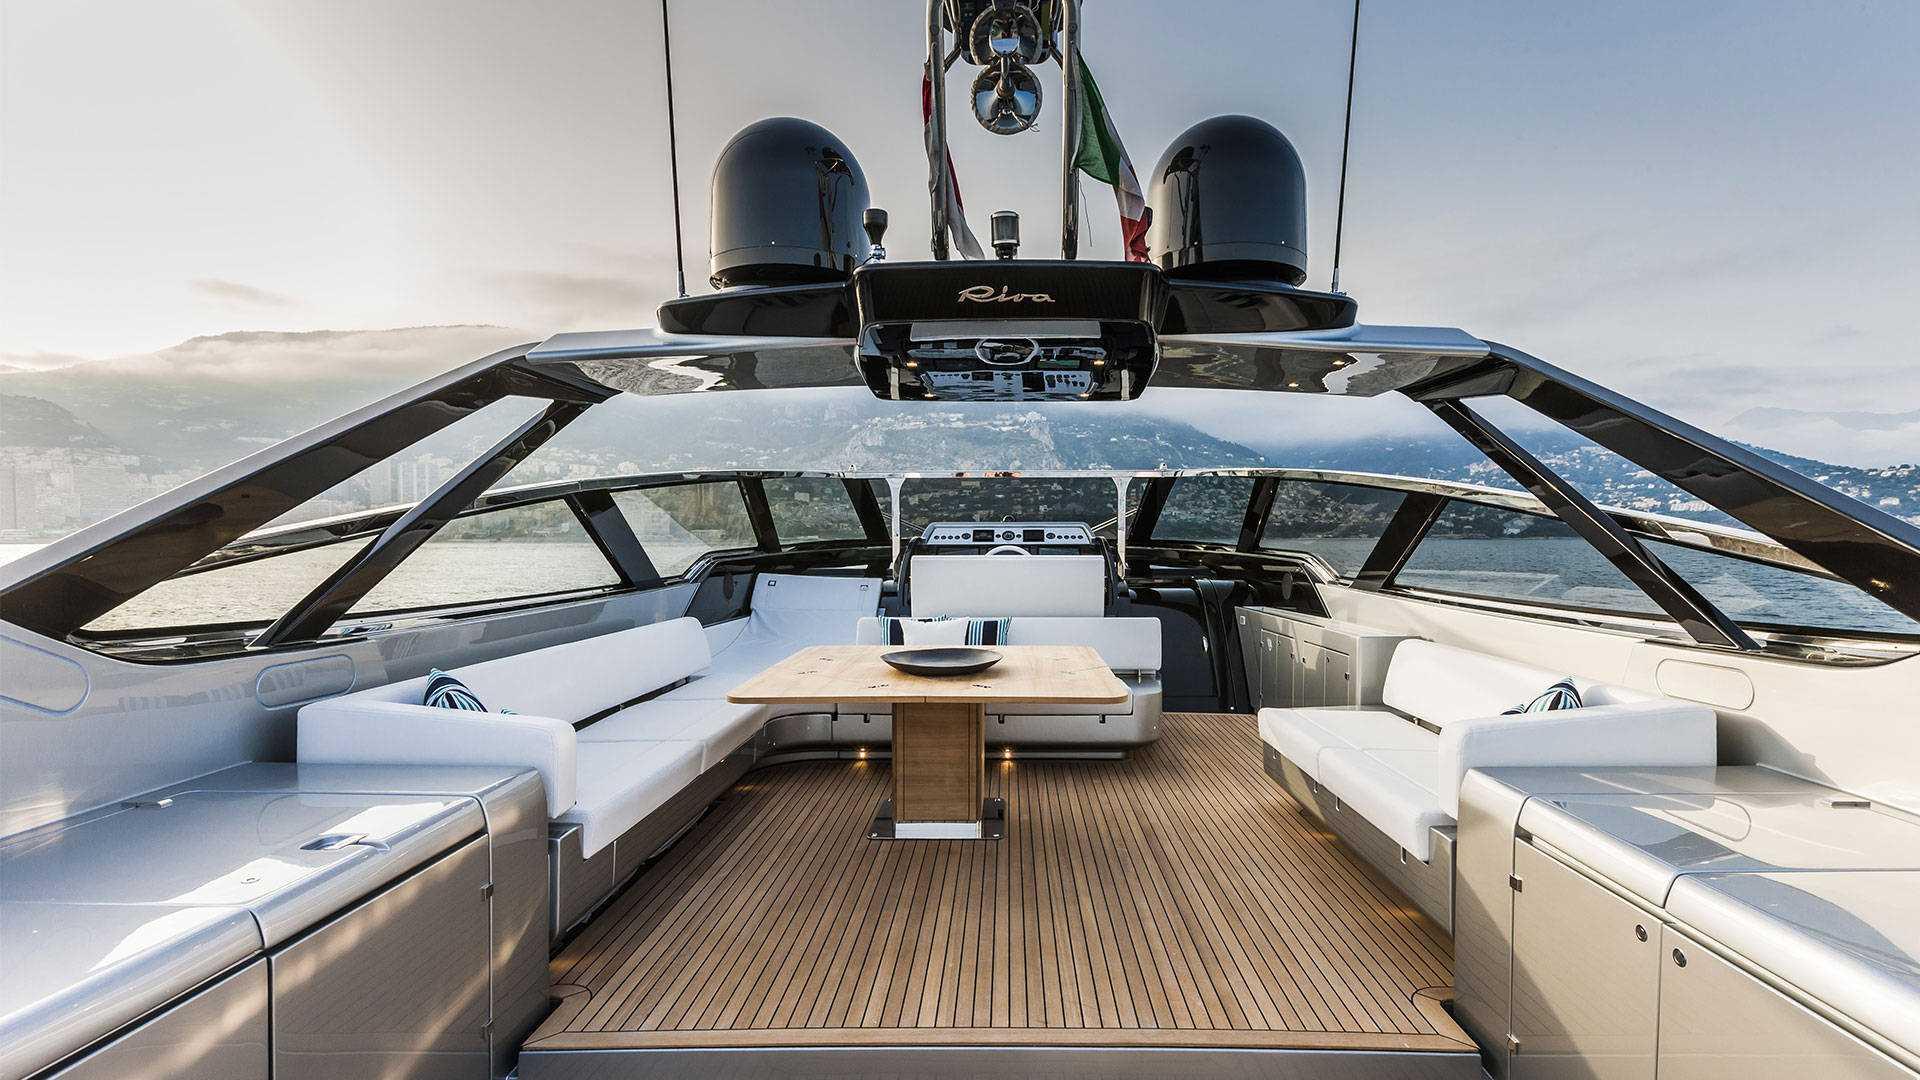 luxusni jachta Riva 88 Florida